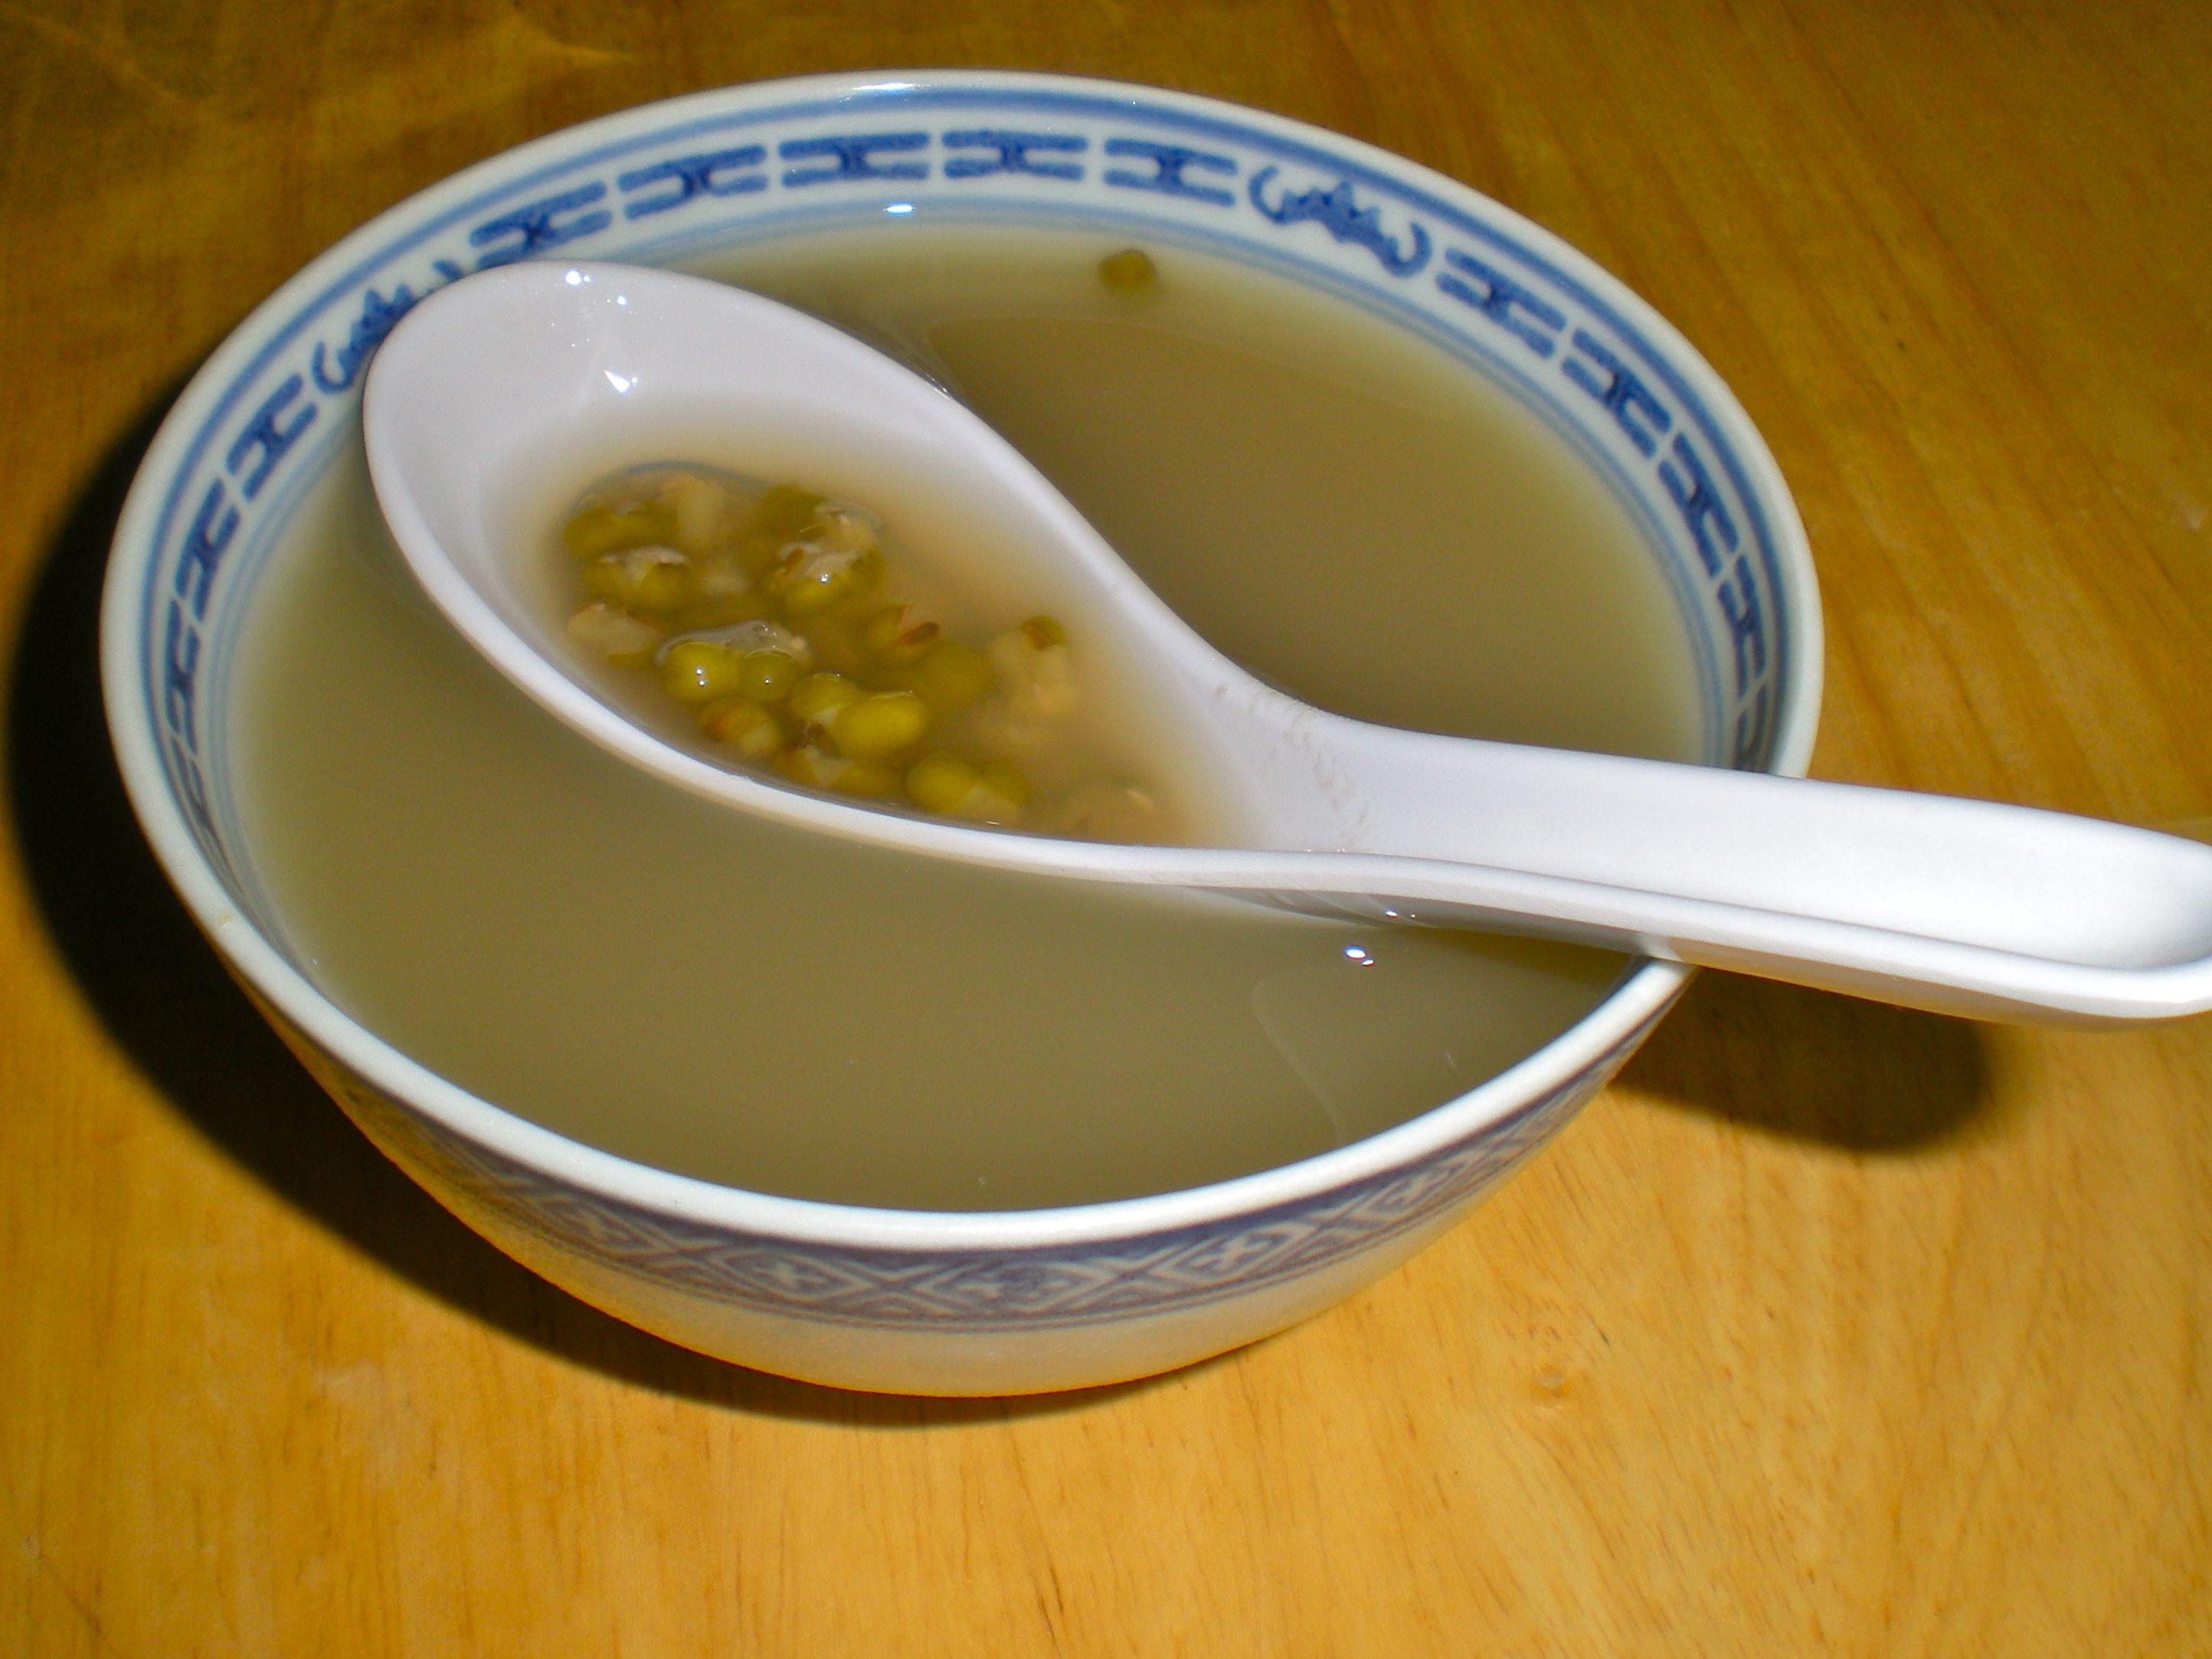 3. Air rebusan kacang hijau